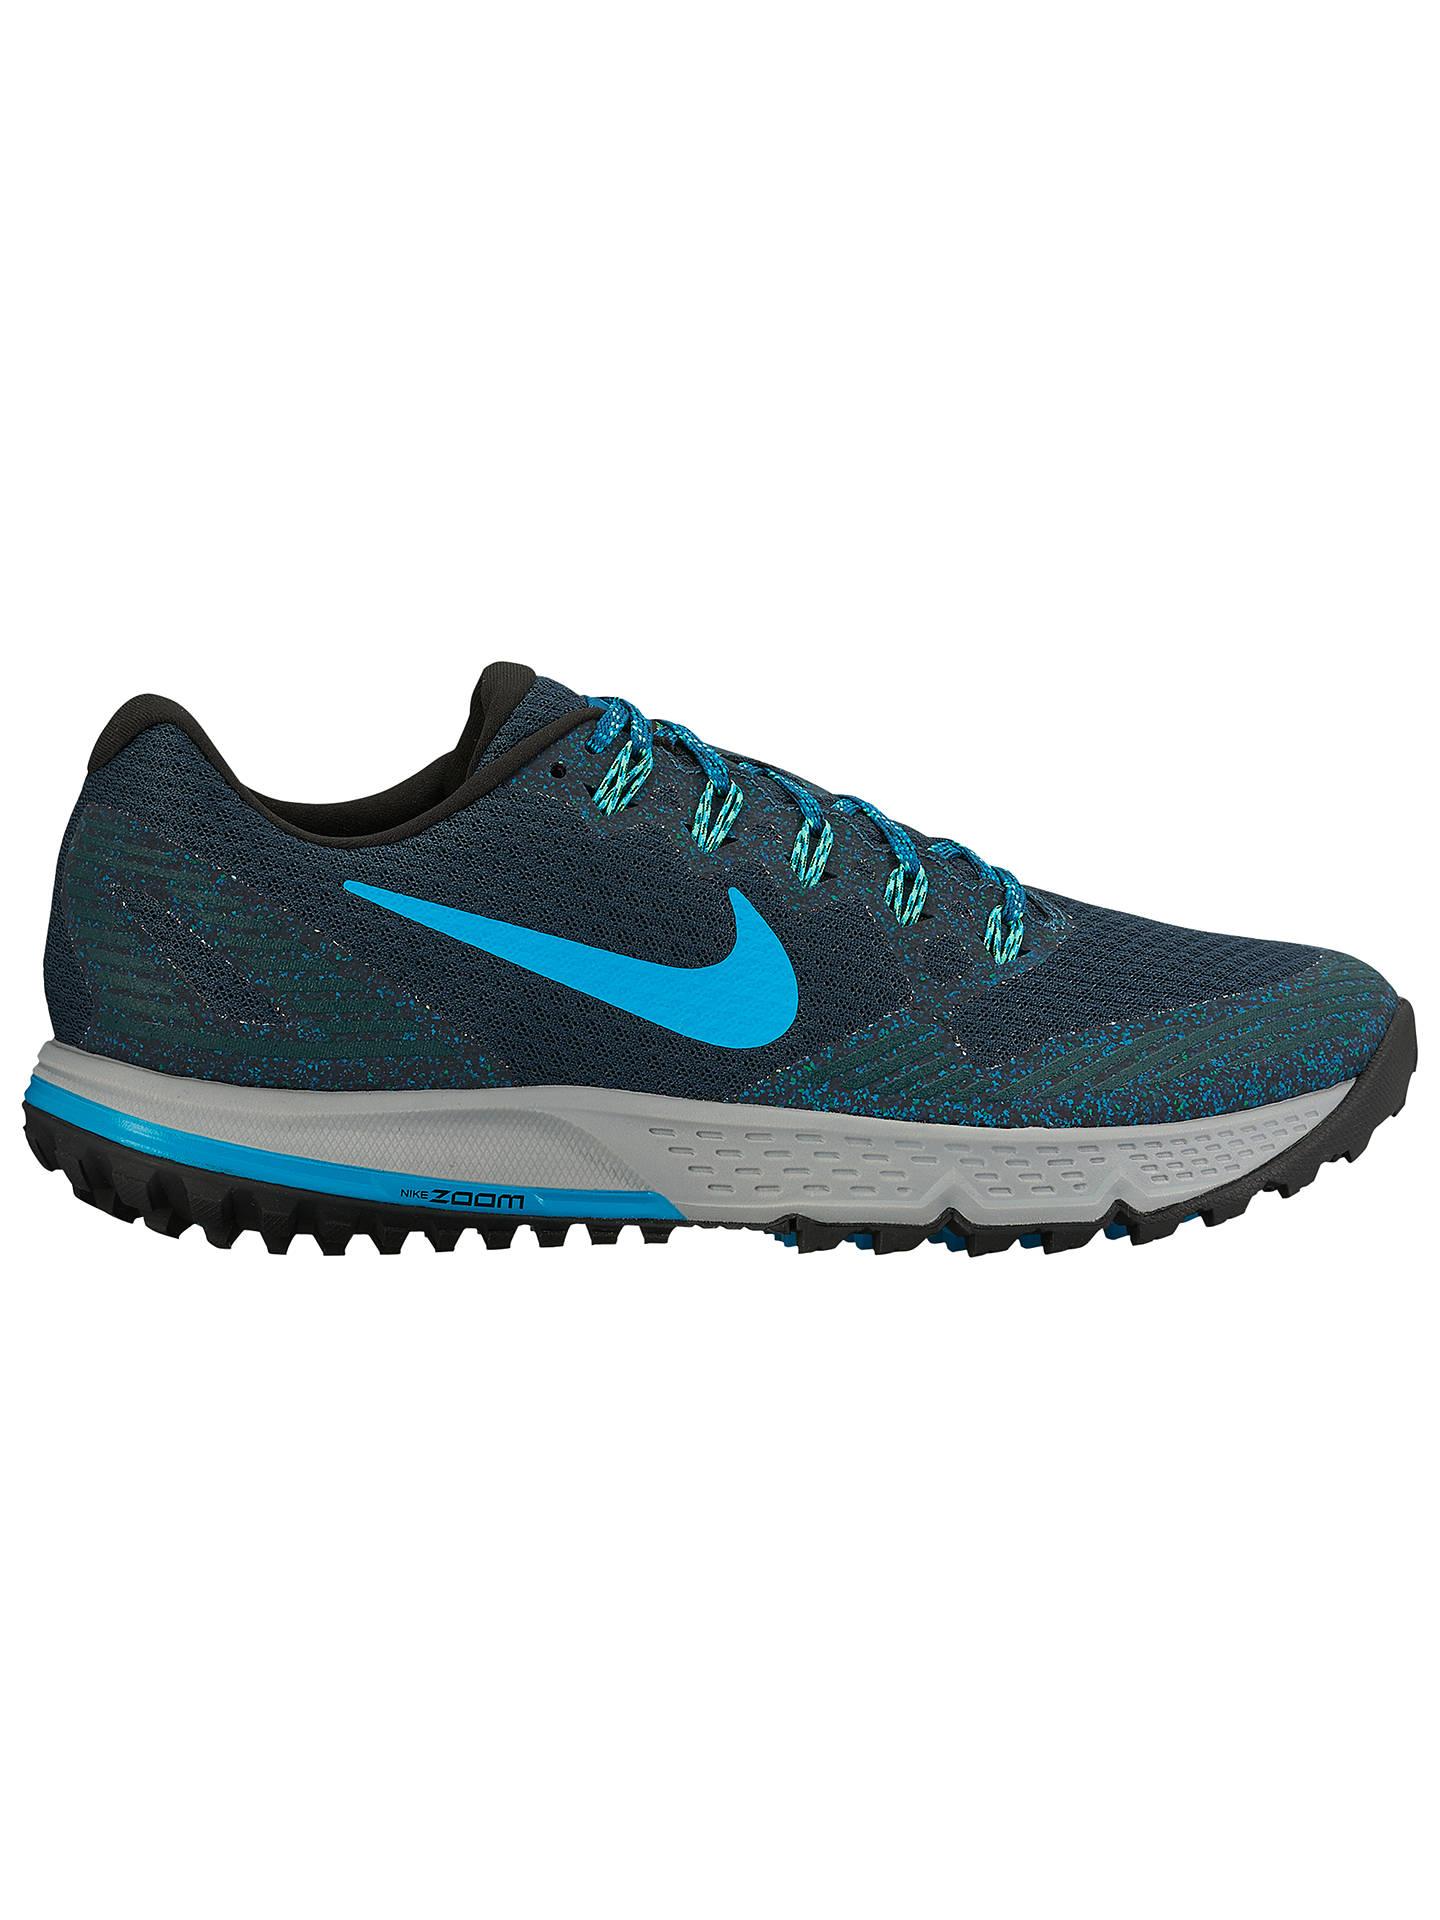 df52b8d9176 BuyNike Air Zoom Wildhorse 3 Men s Running Shoes